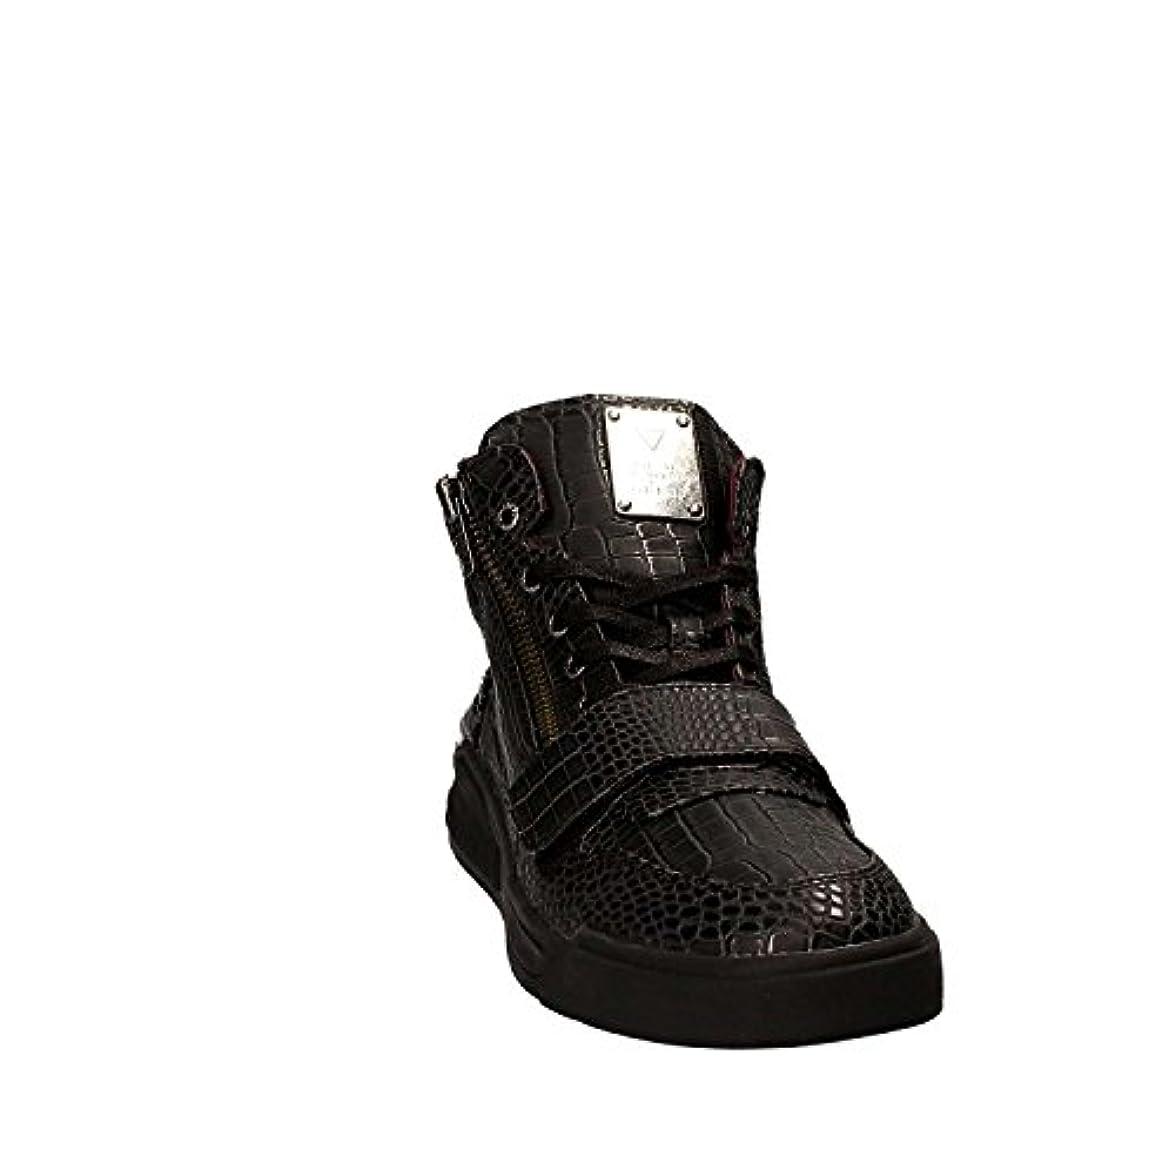 Guess Sneaker - Fmknb4 Pel12 Size 44 eu